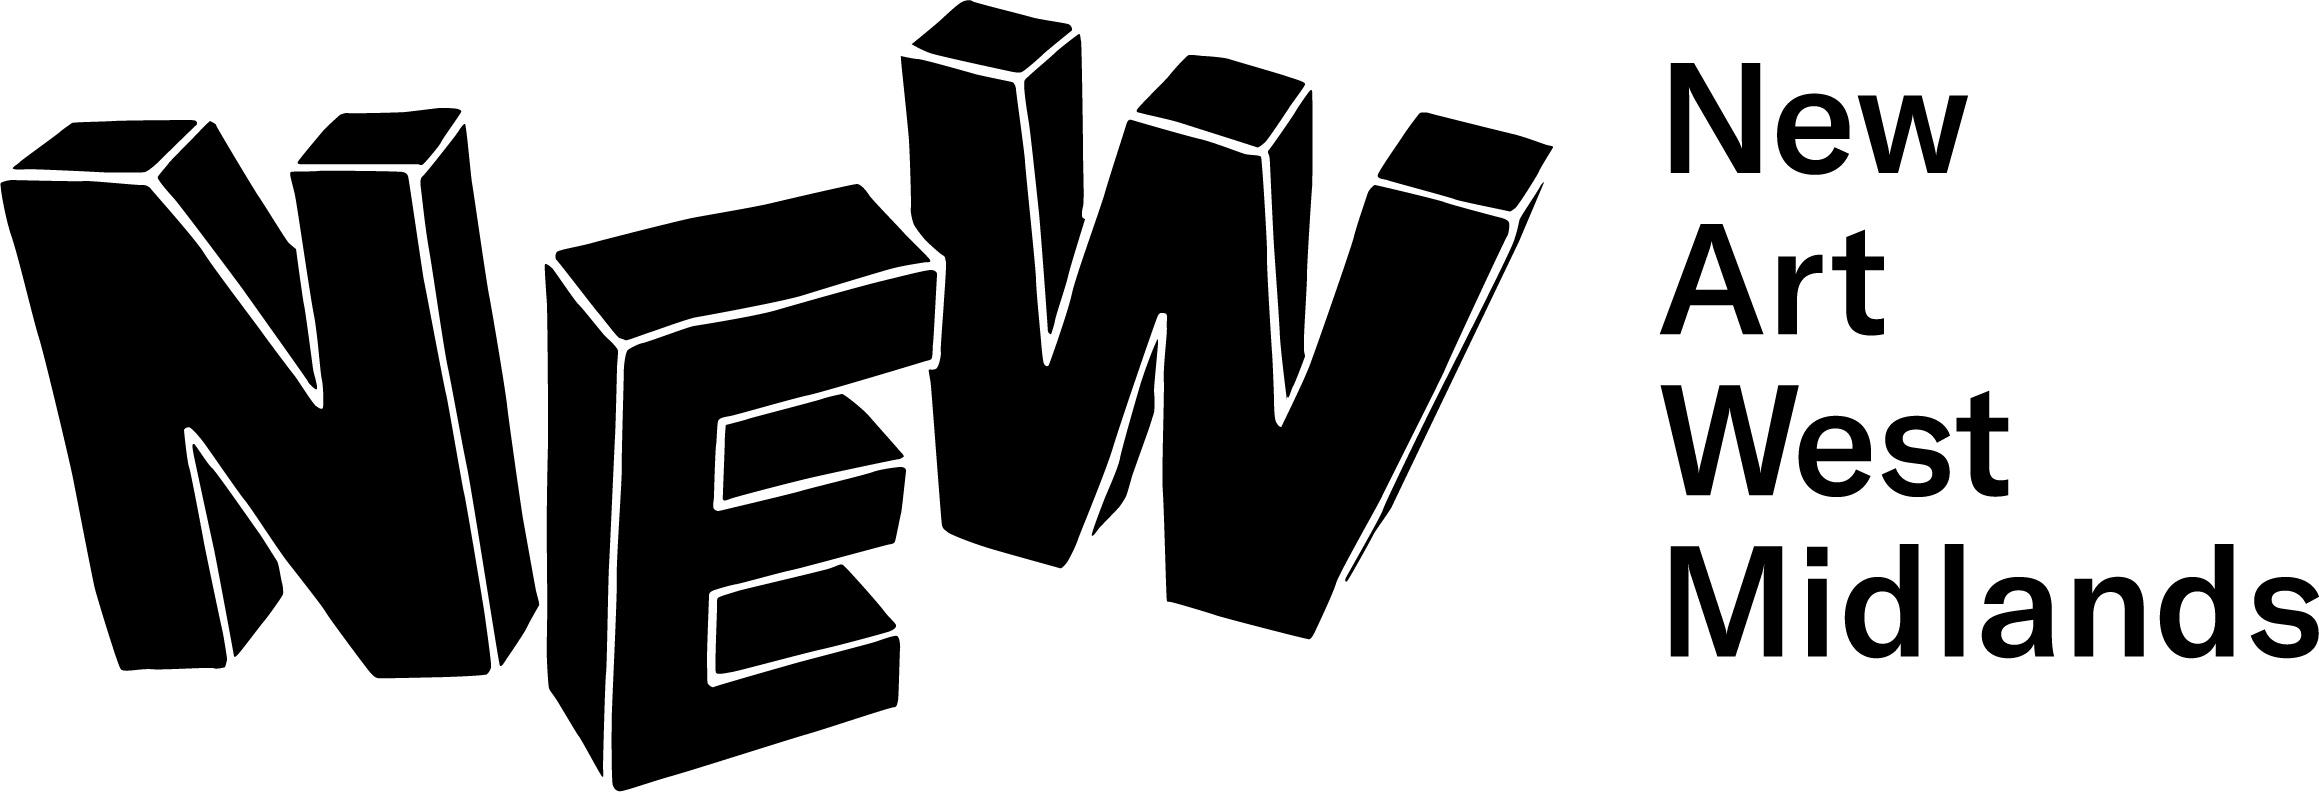 NAWM Logo 1.jpg